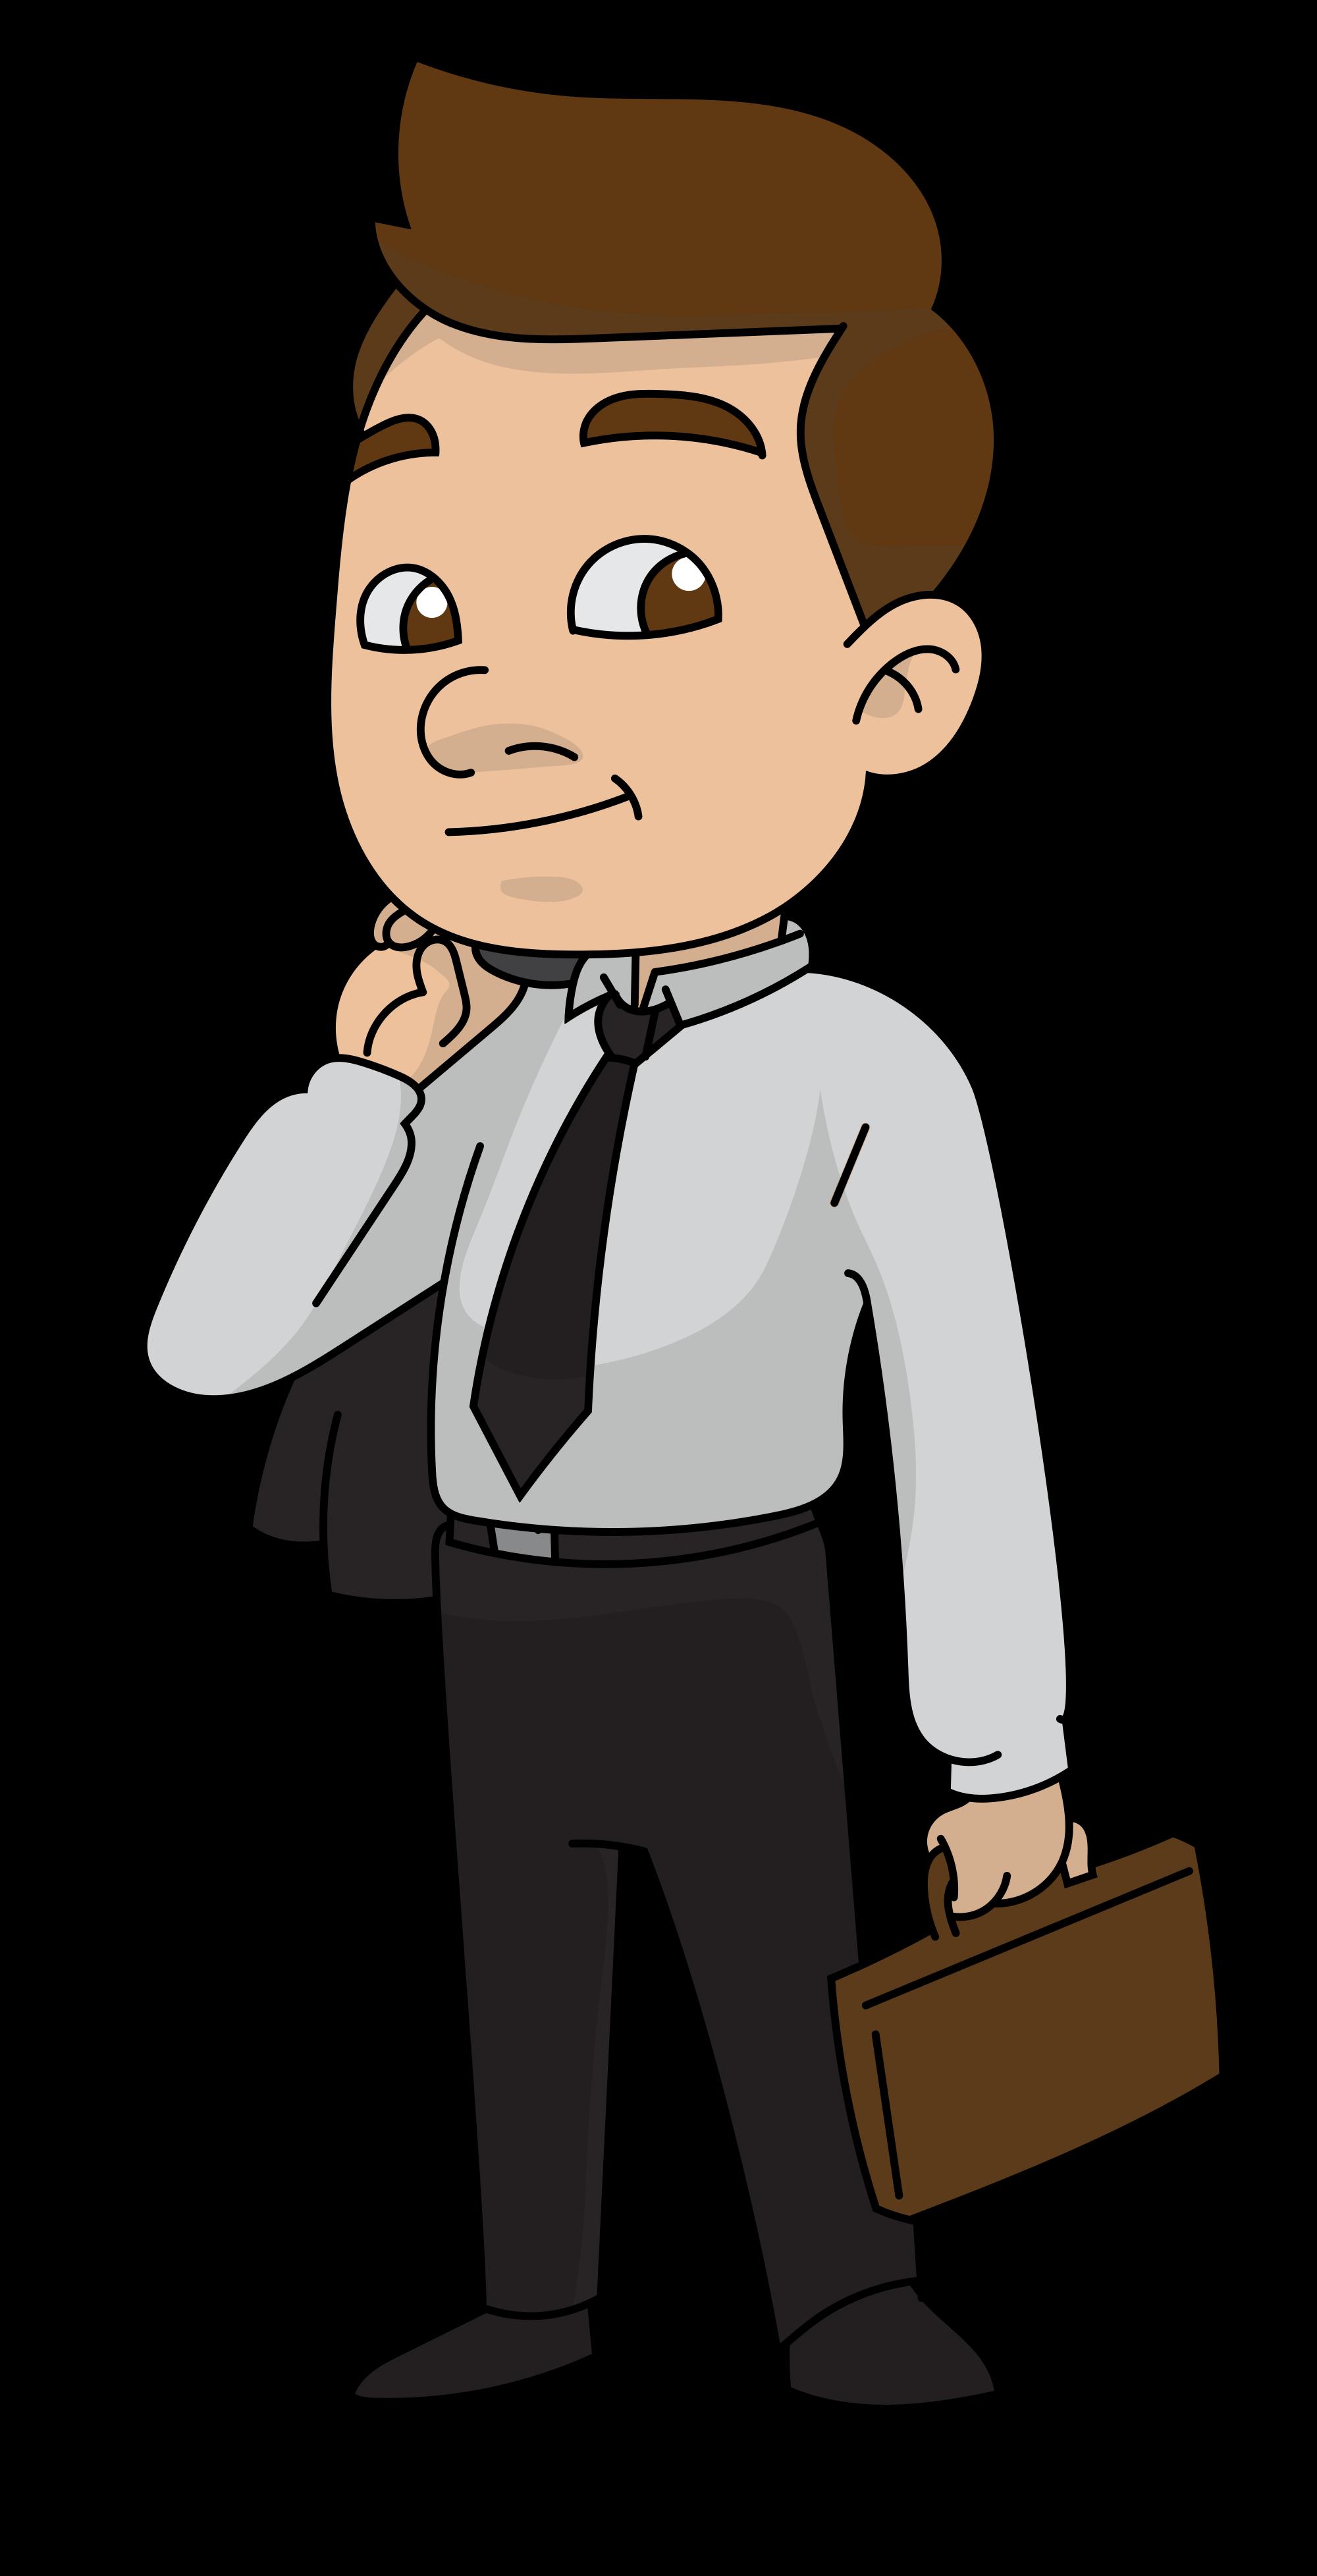 English clipart author at work. File cartoon businessman ready